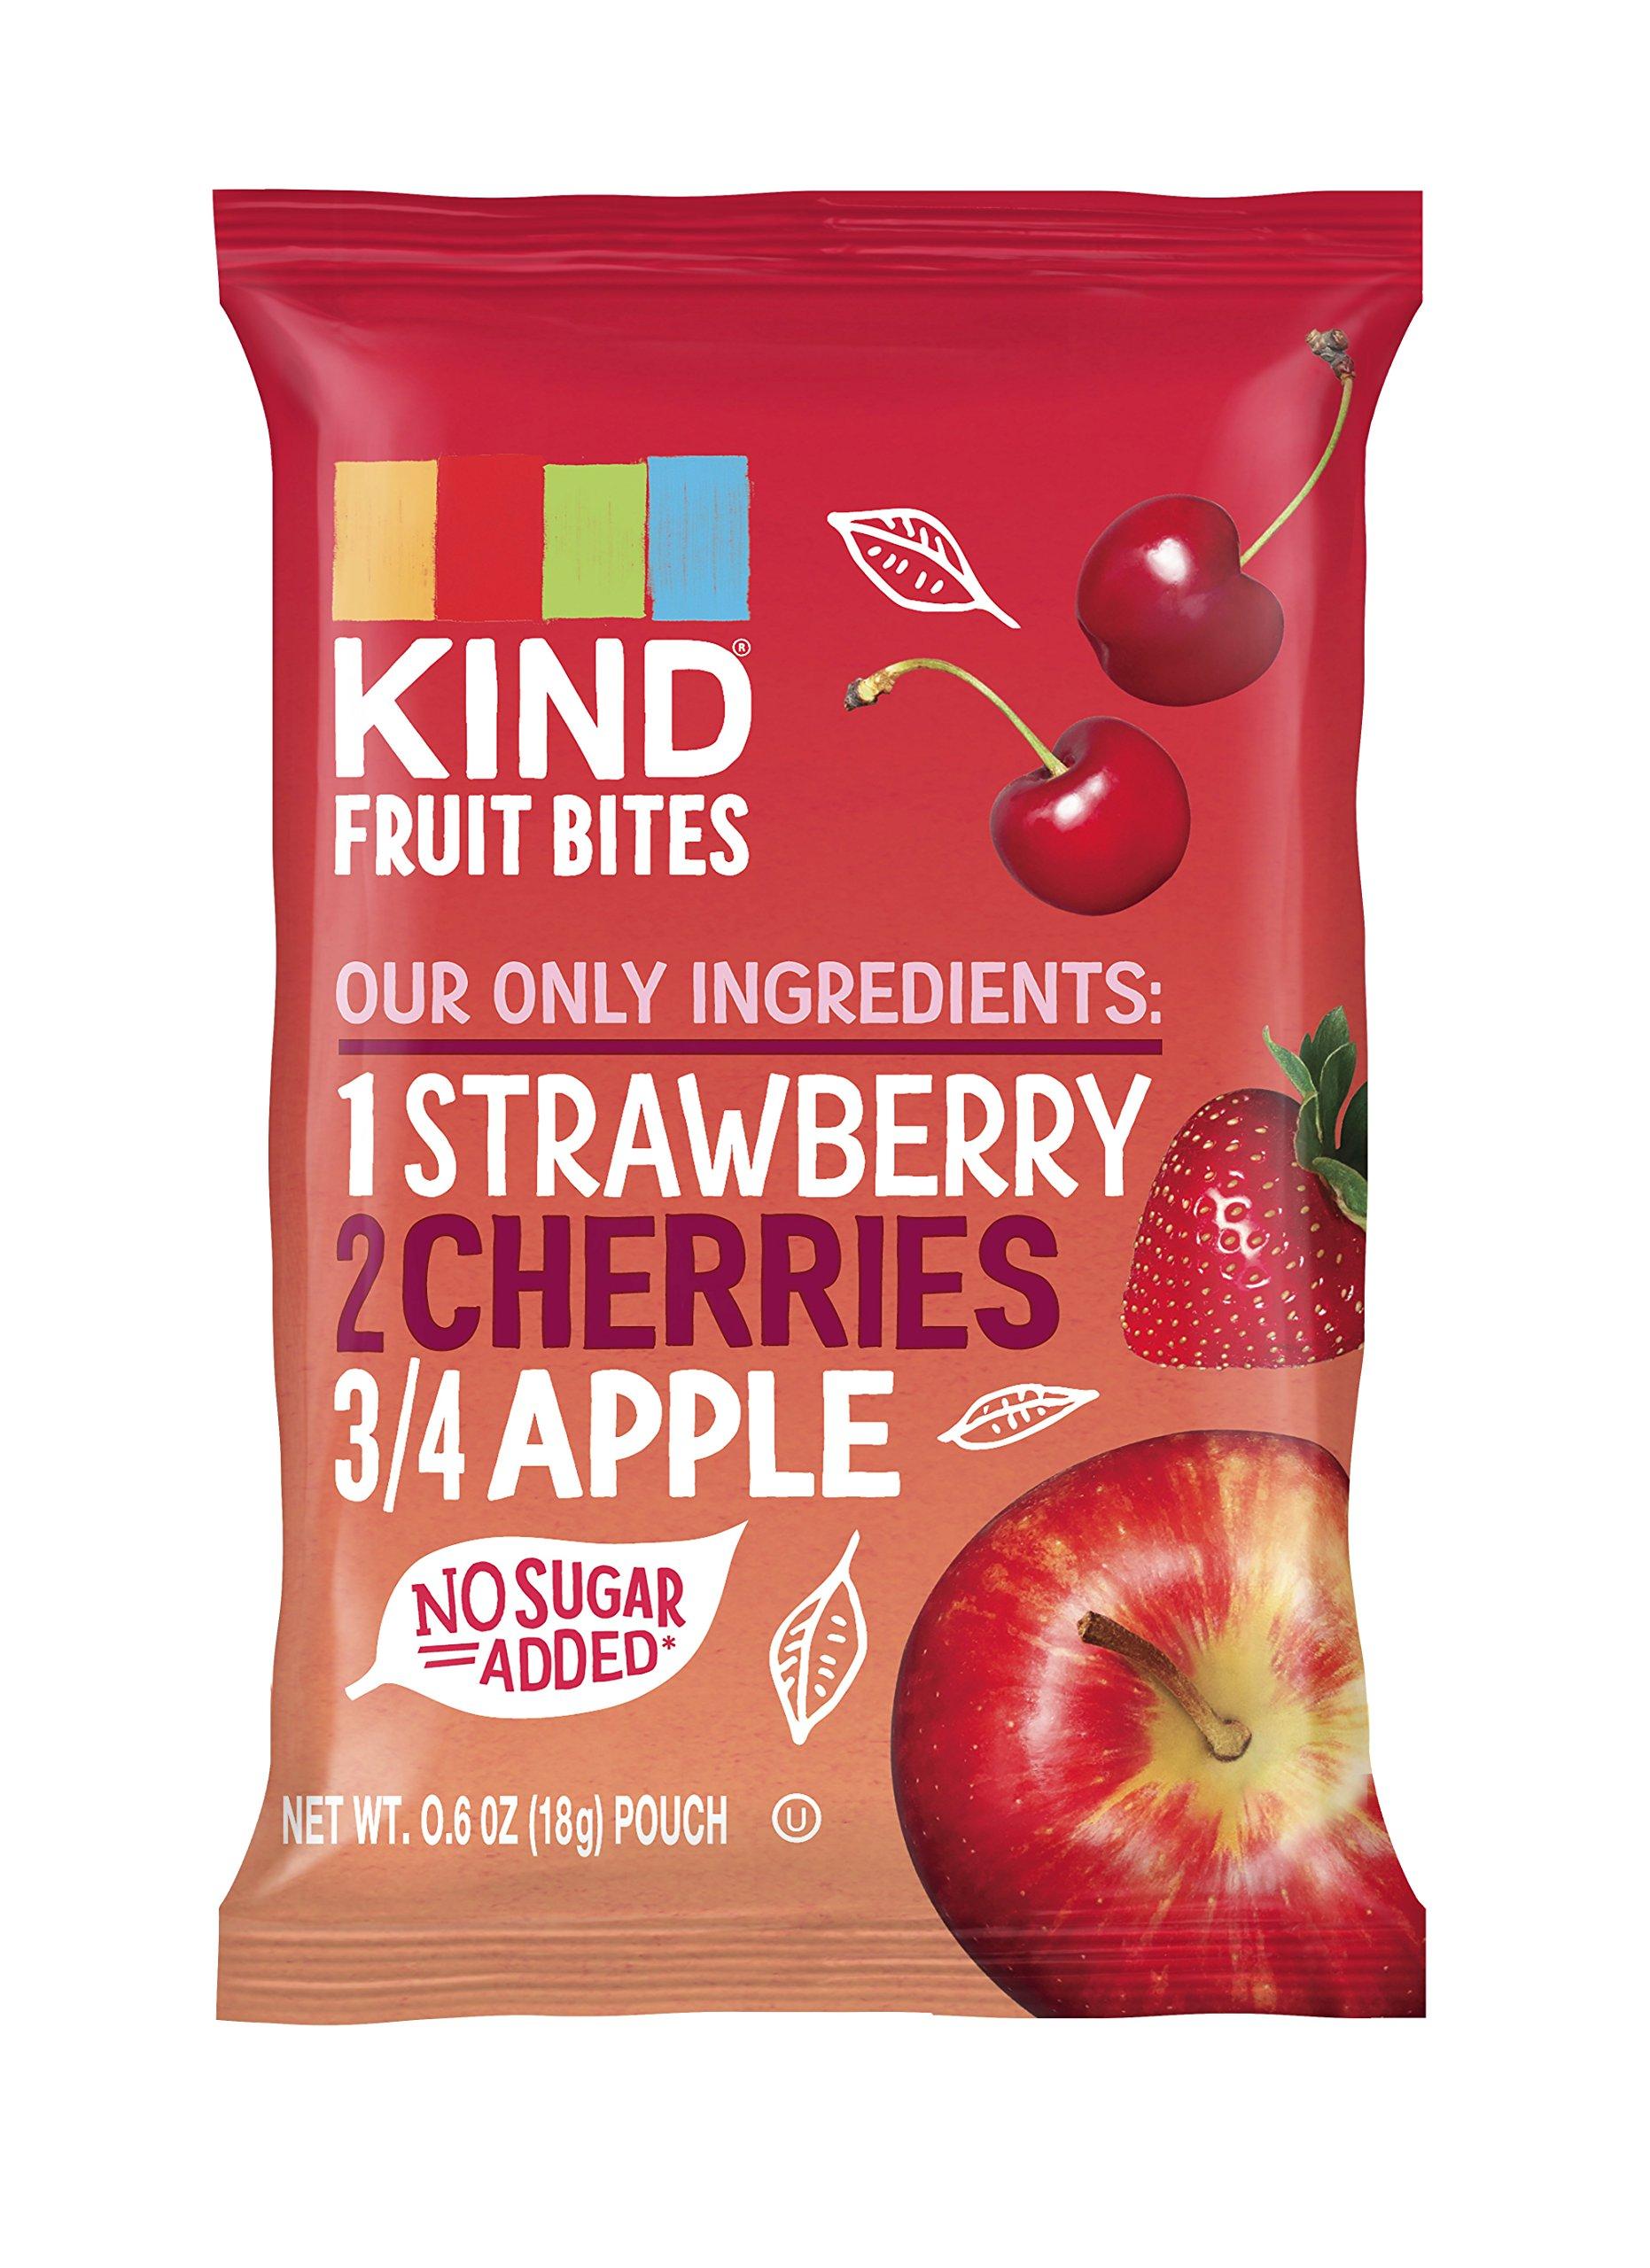 KIND Fruit Bites Fruit Snacks, Strawberry Cherry Apple, No Sugar Added, Non GMO, Gluten Free, .6oz Sample